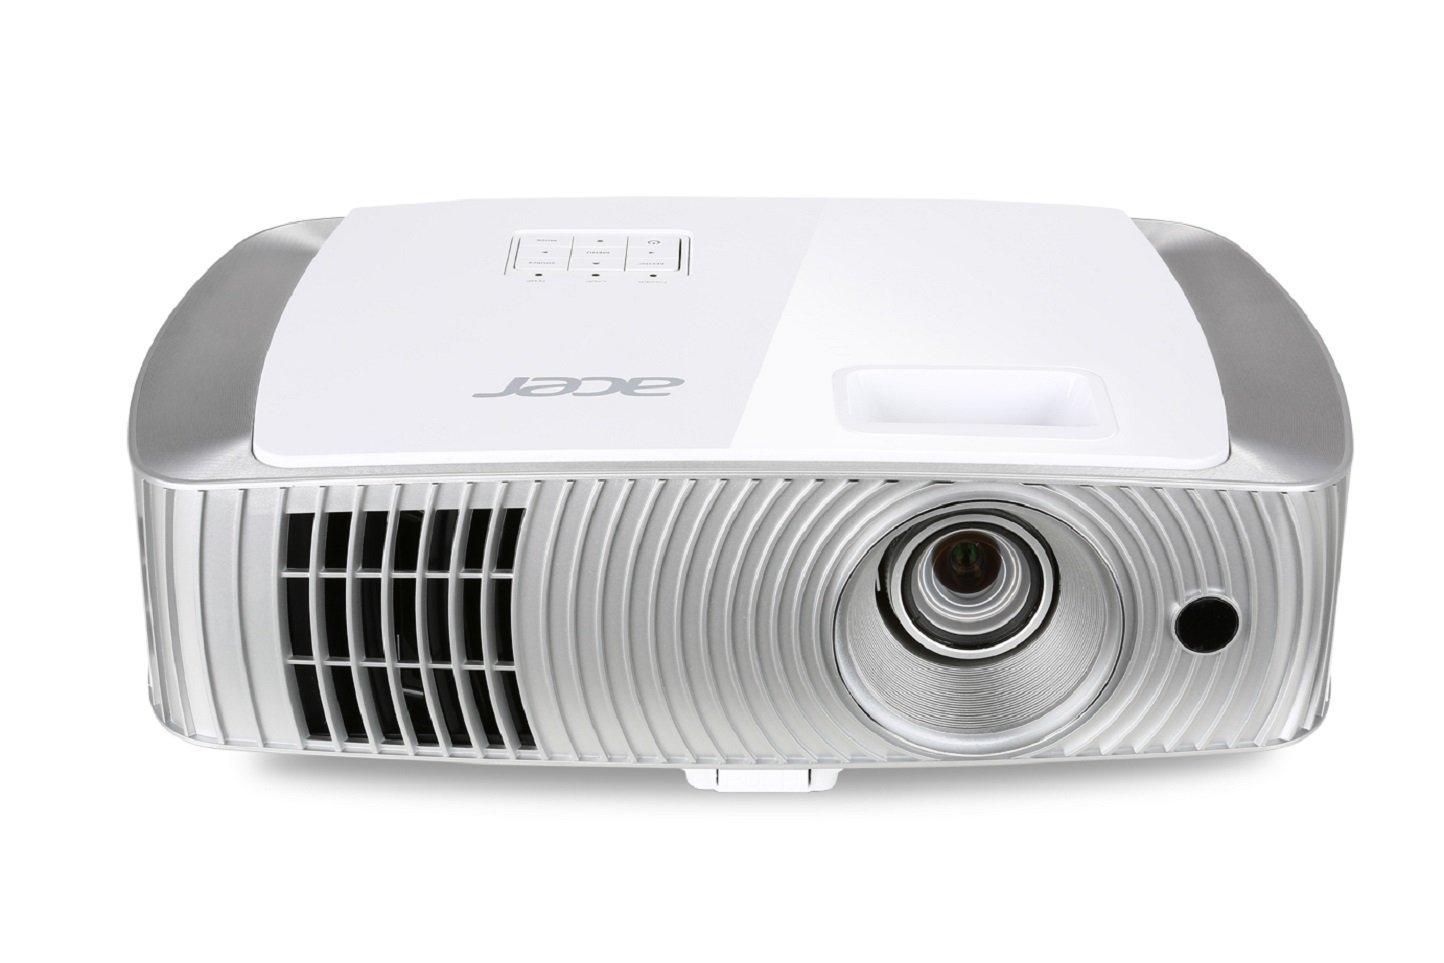 [amazon.de] Acer H7550BDz 3D Full HD DLP-Projektor inkl. Acer Wireless HD Kit für 589,99€ (PVG 799€)